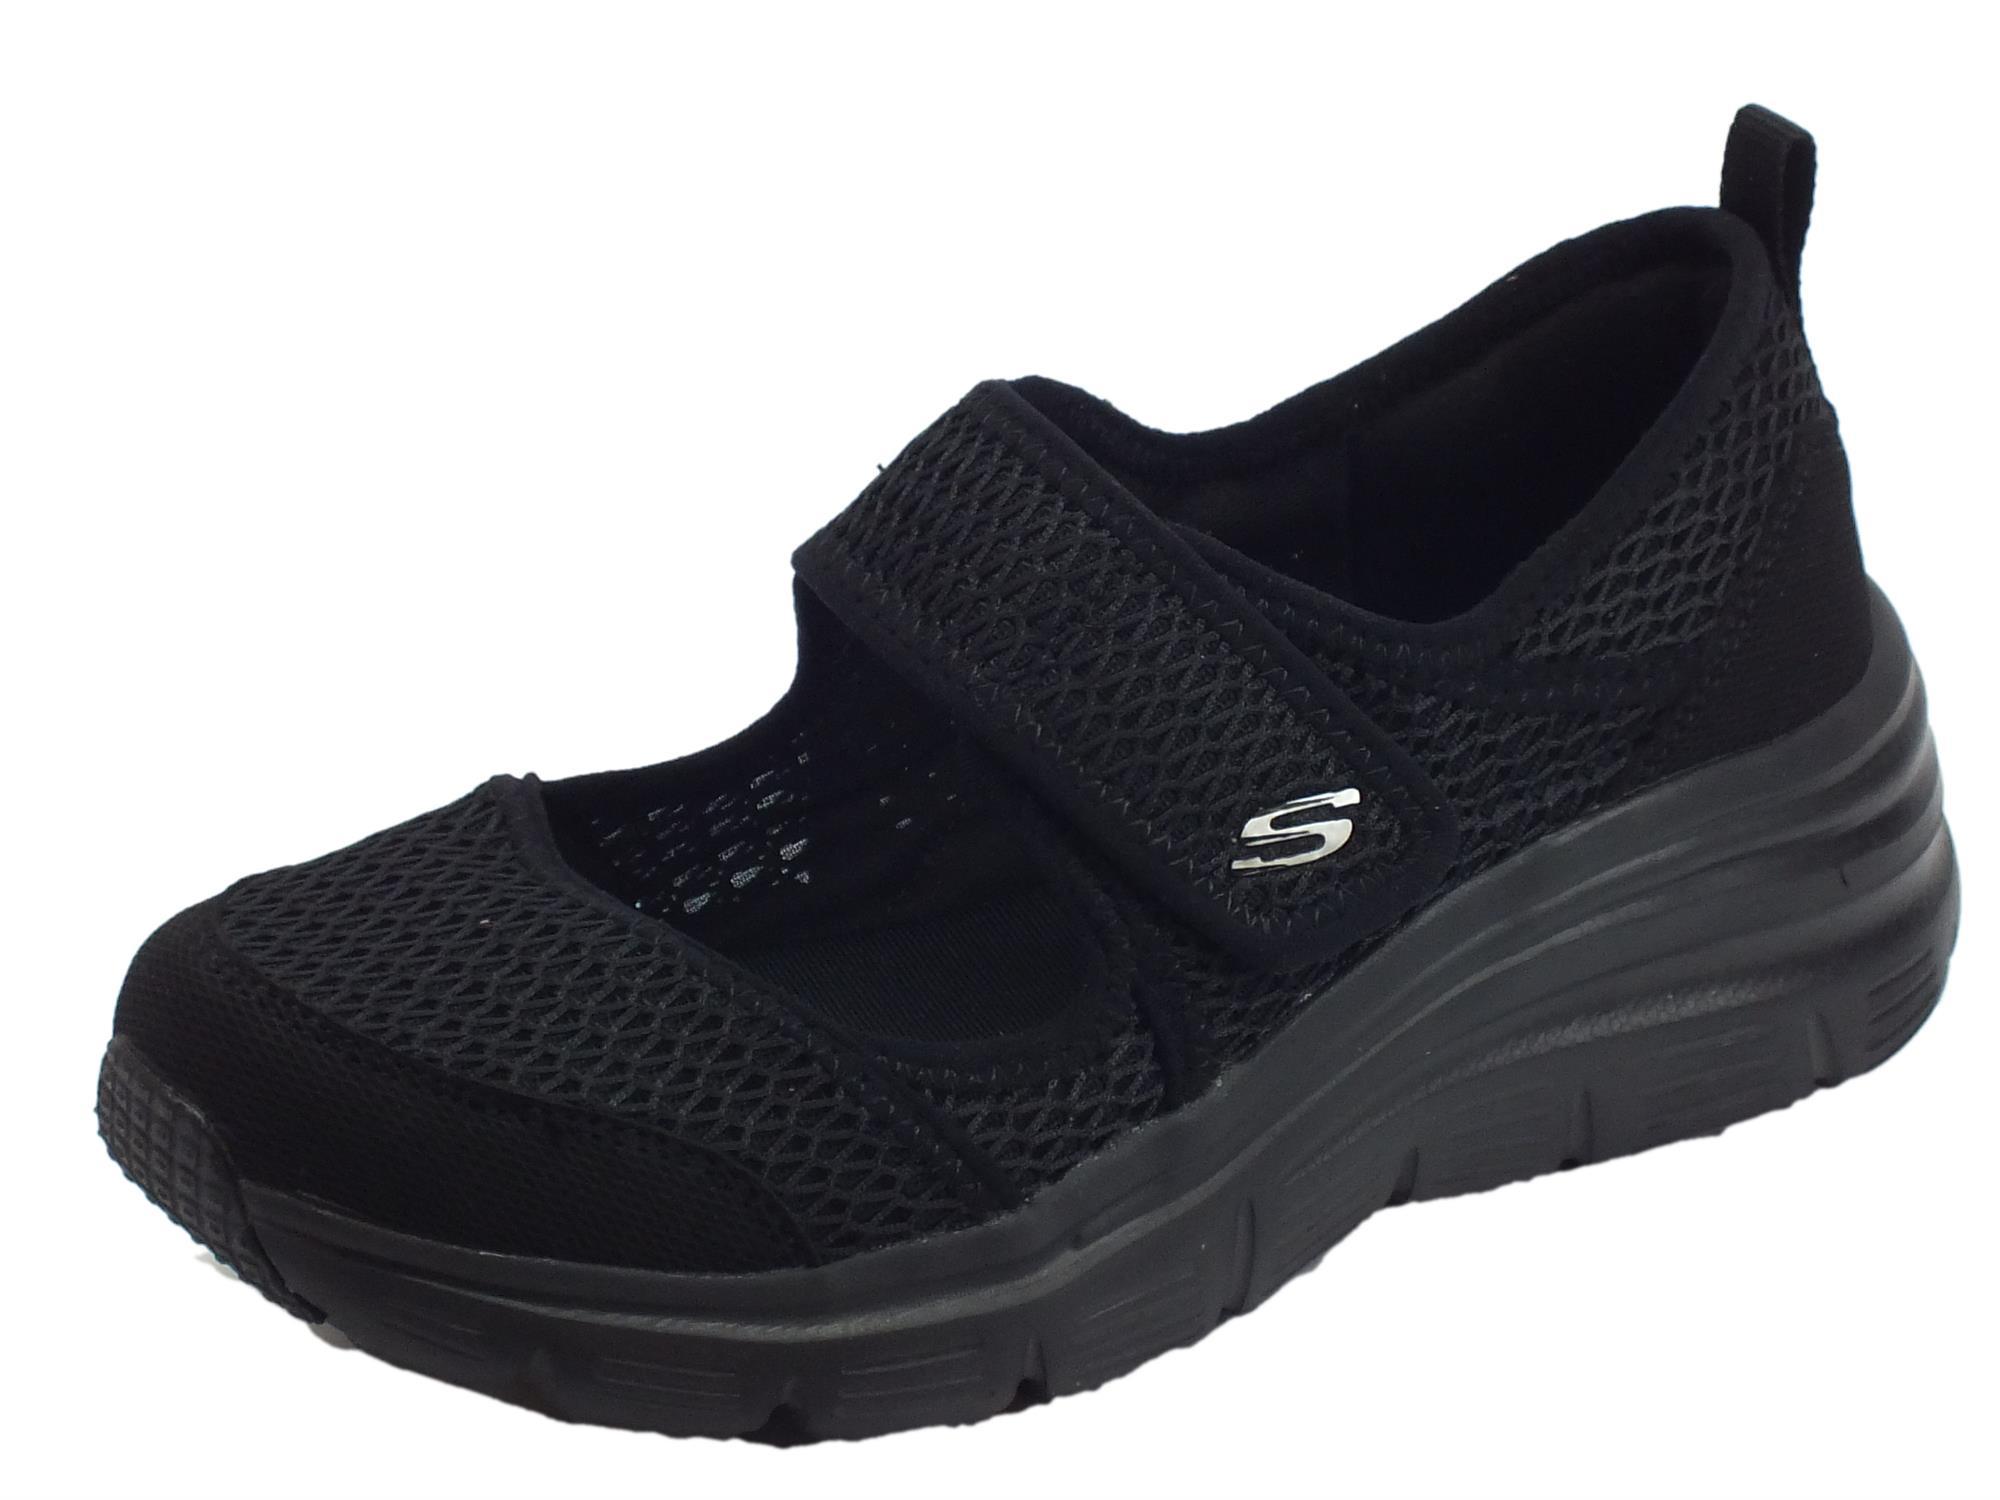 9e5a58403580b Skechers Fashion Fit Breezy Sky scarpe Sportive donna nere ...